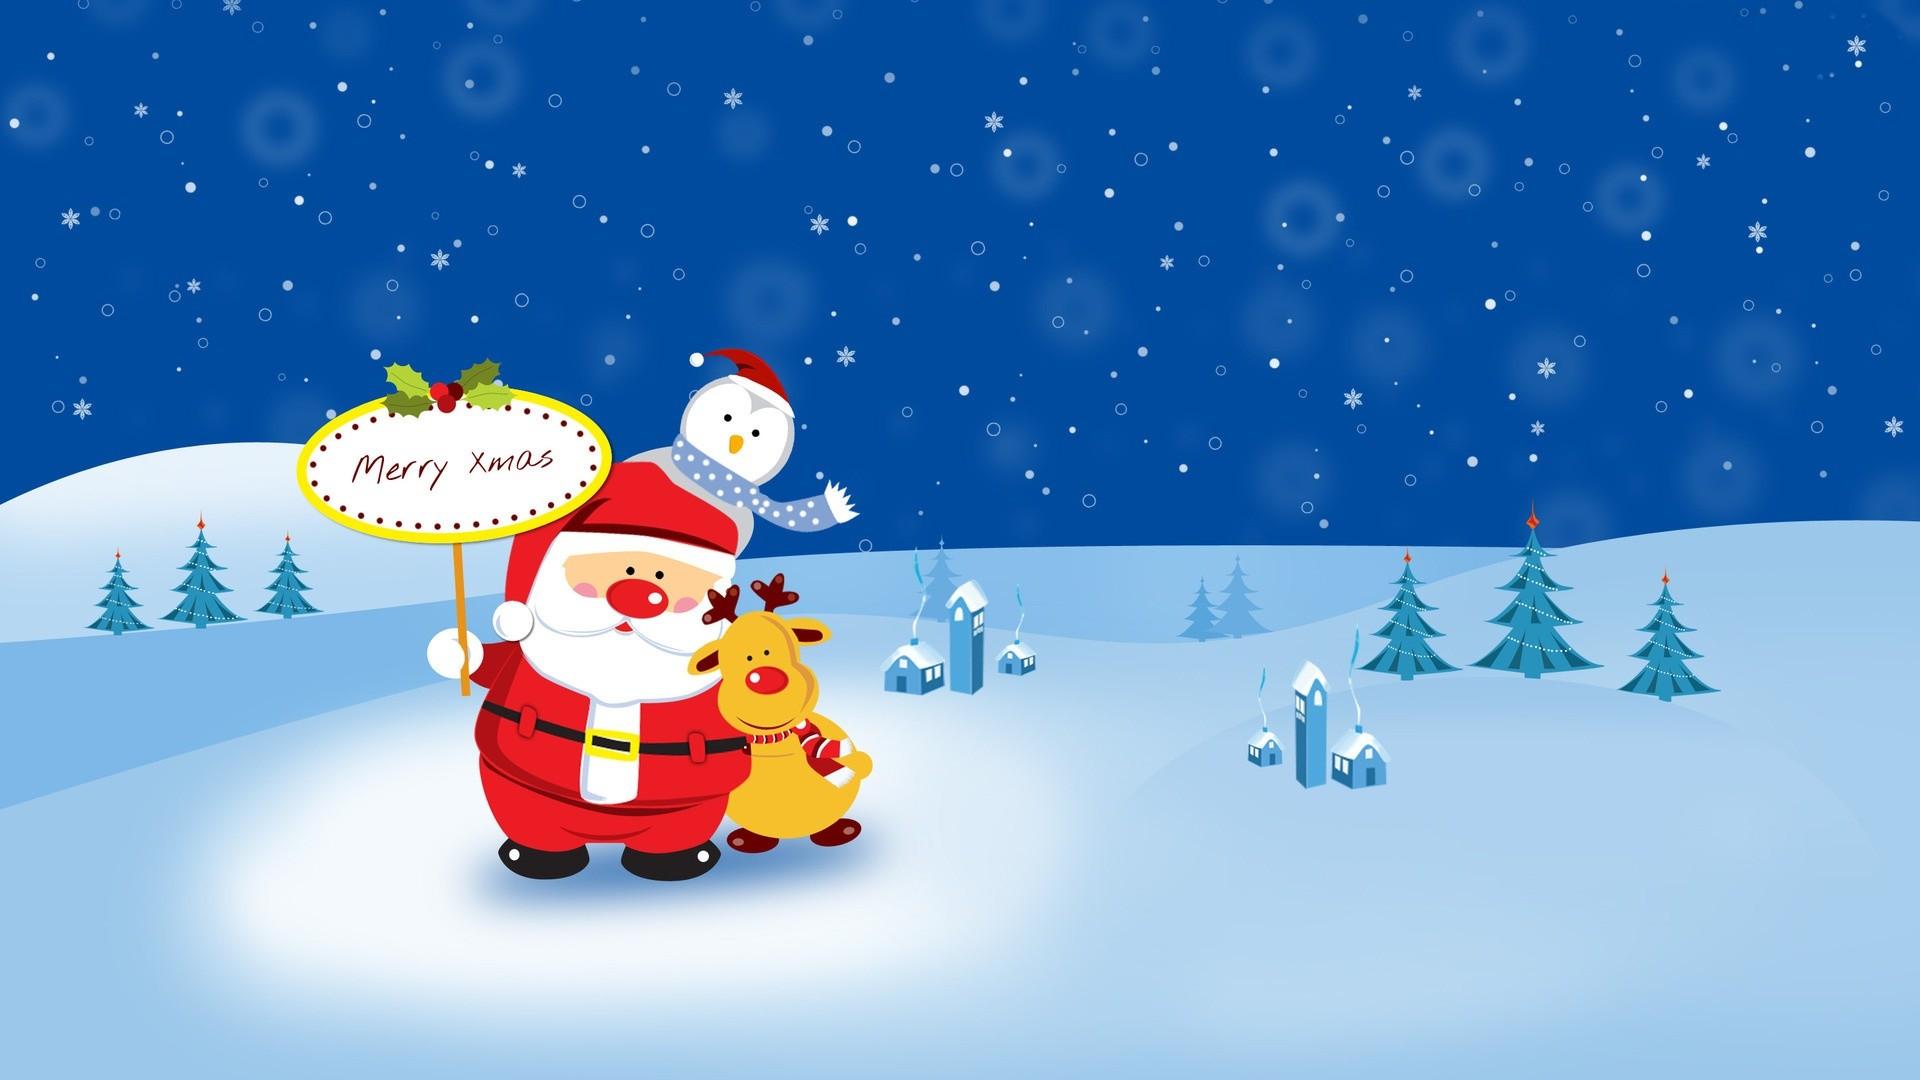 holiday screensavers and wallpaper  66  images